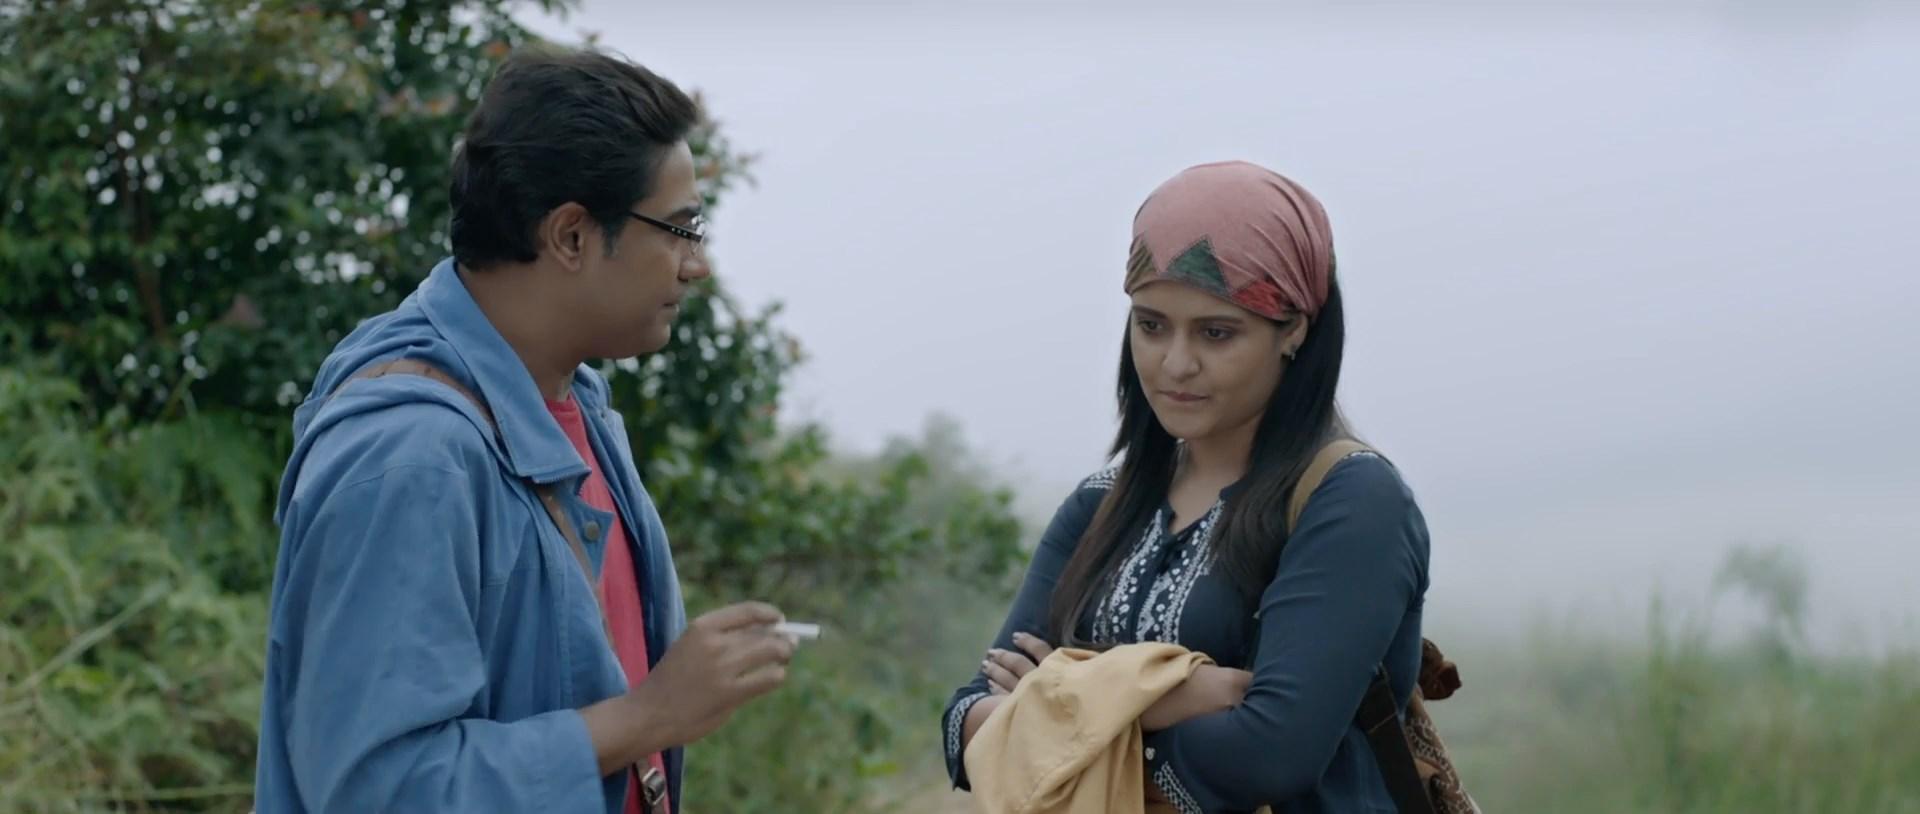 KAYA The Mystery Unfolds 2021 Bengali Movie 1080p WEB DL x264 AAC.mp4 snapshot 01.13.48.416